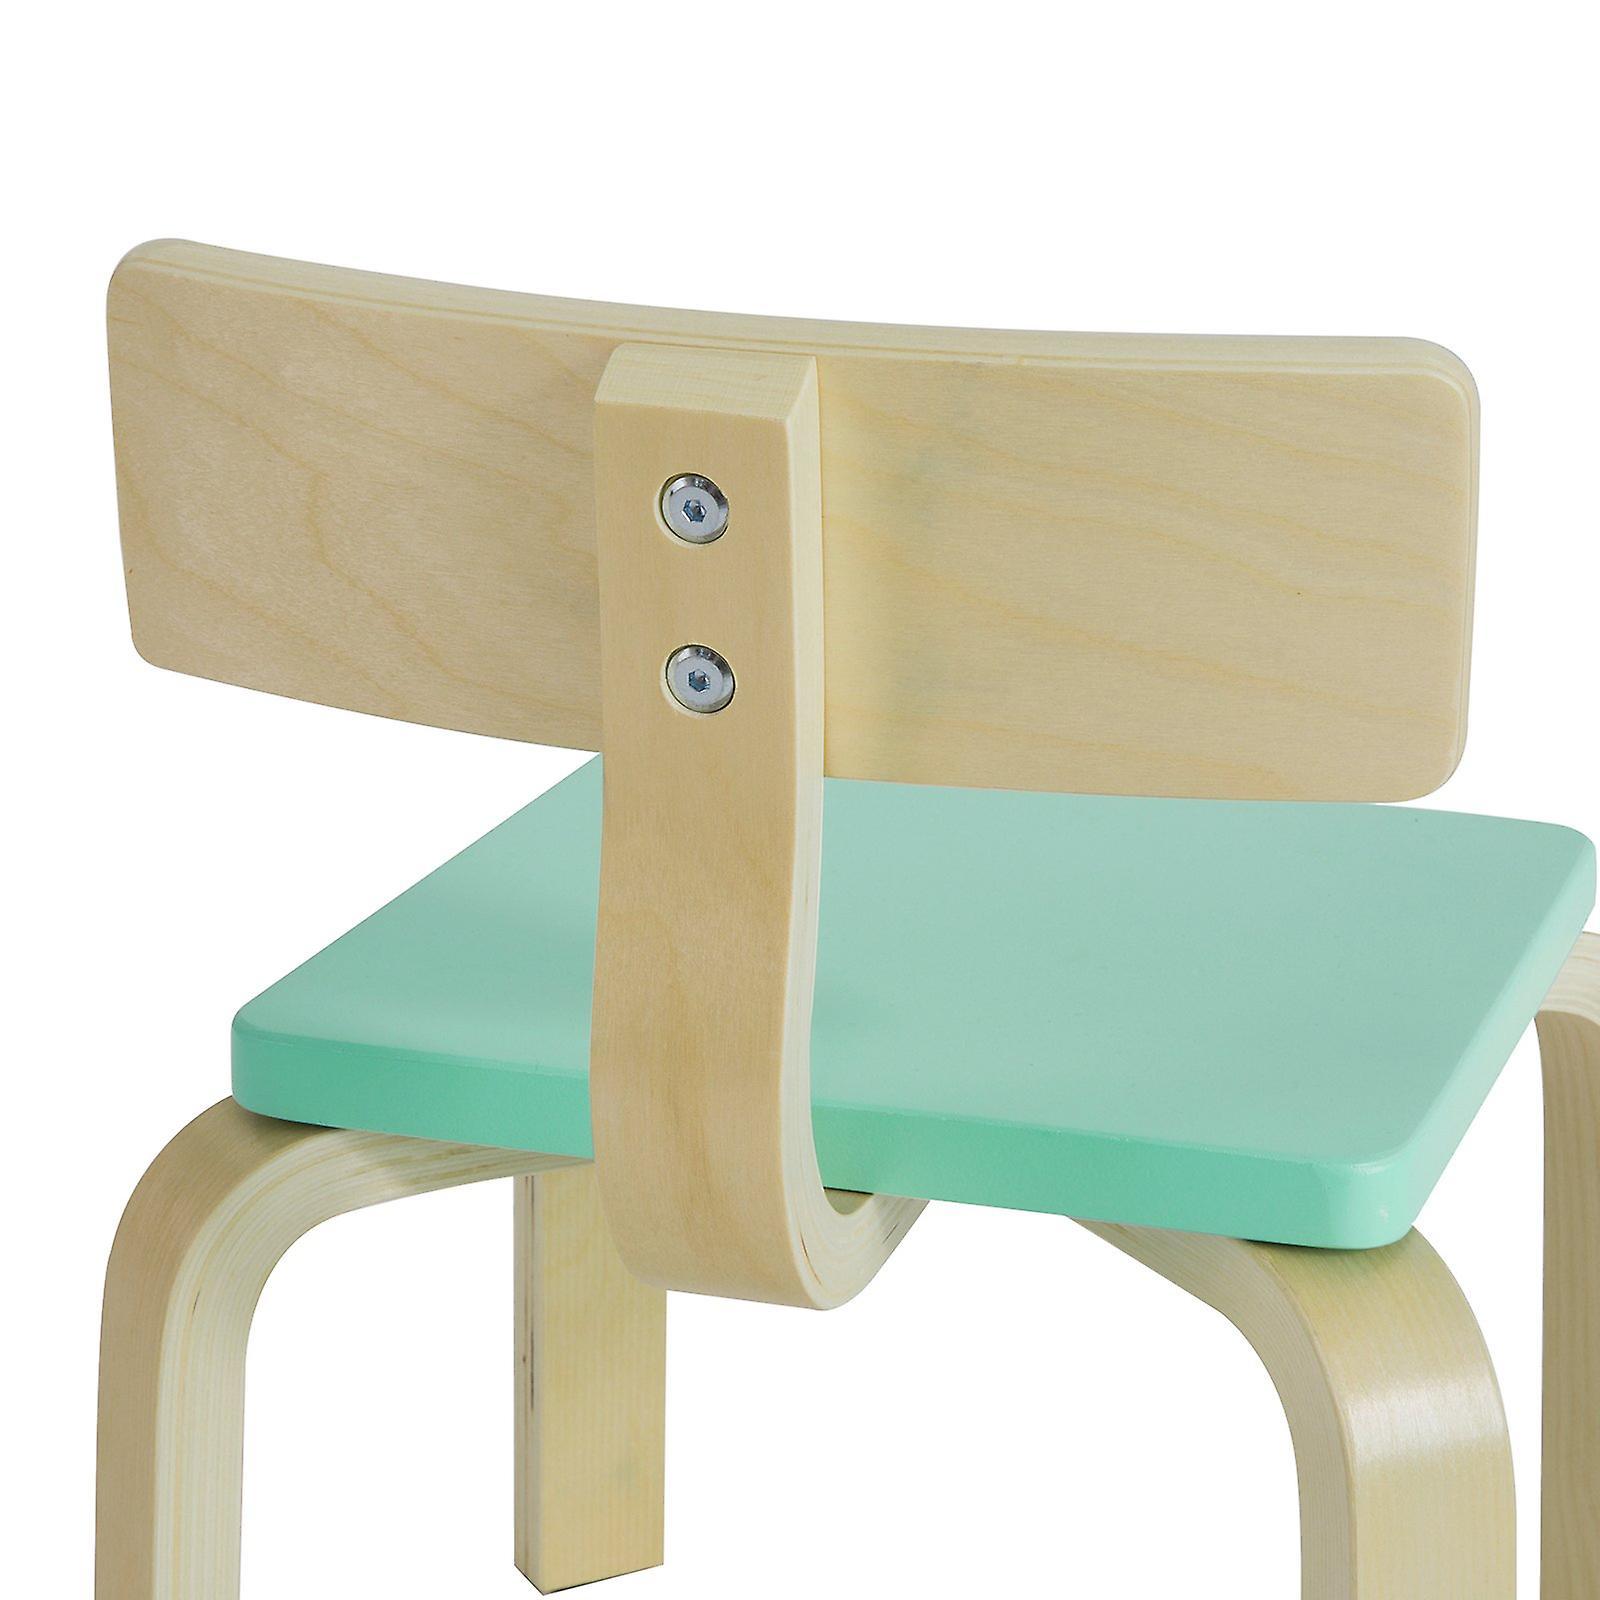 SoBuy KMB29-HB, Children Chair, Wooden Kid Children Chair with Backrest, Children Room Chair, Green Seat